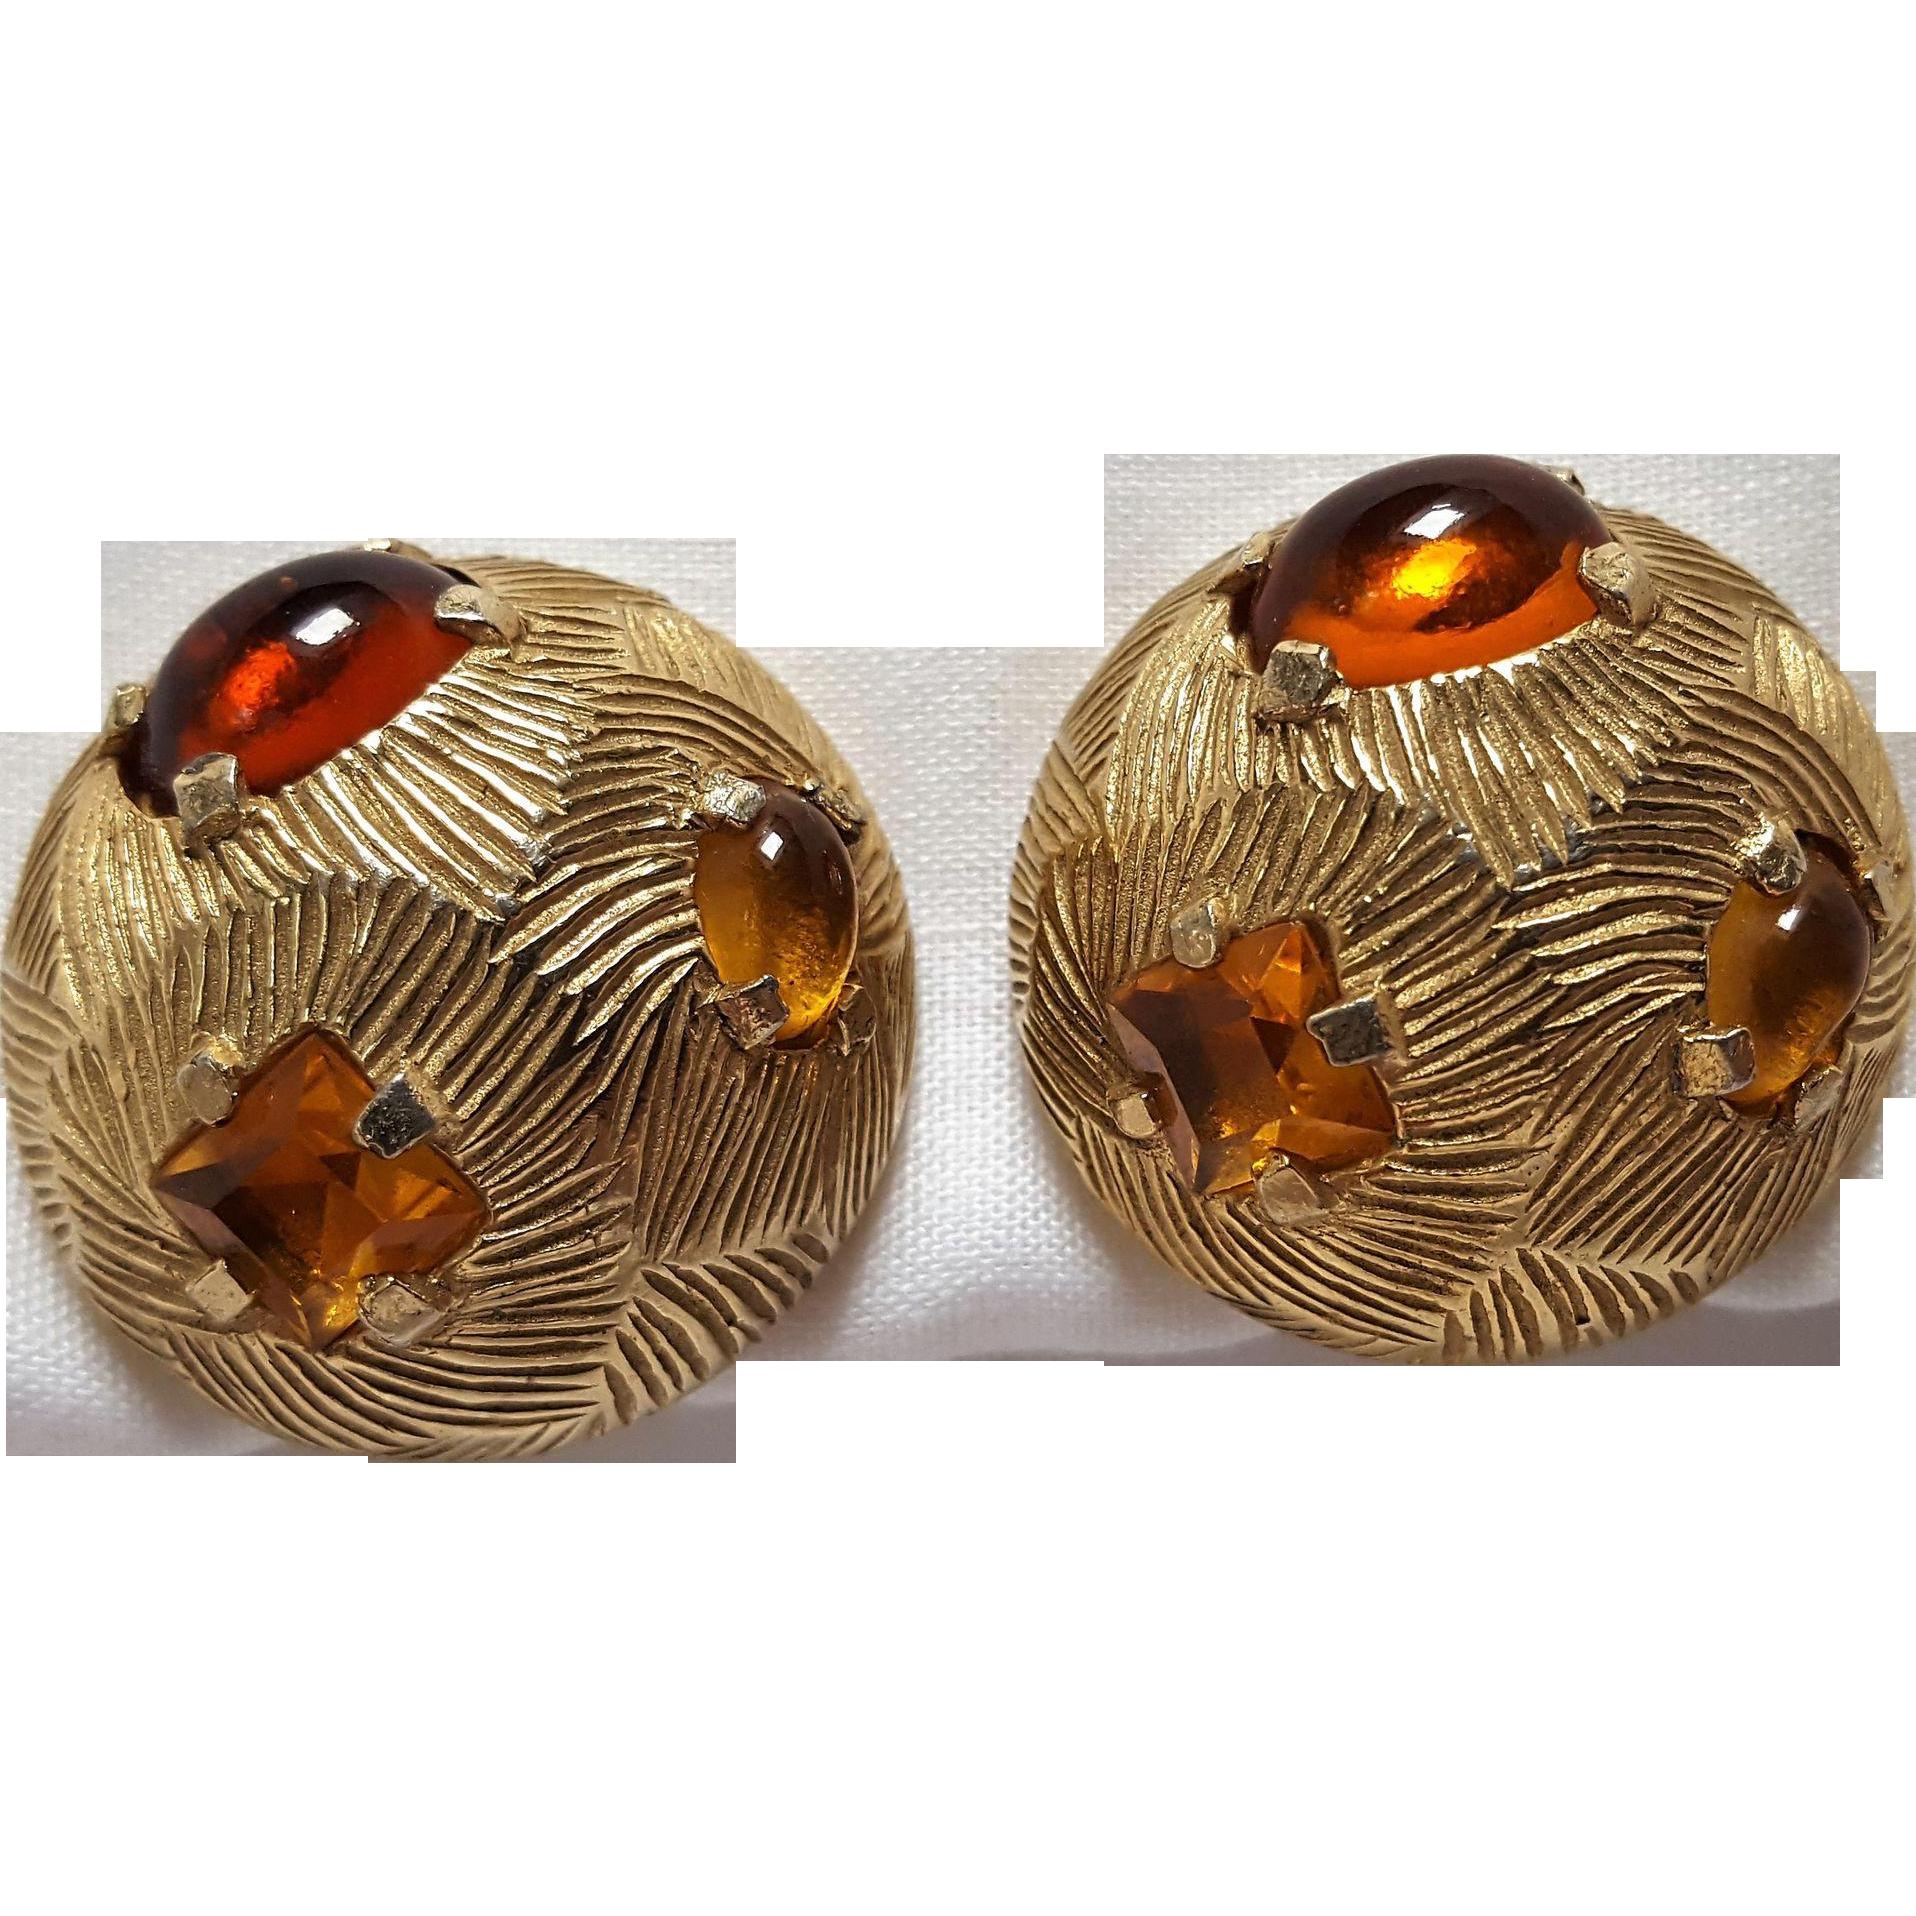 Castlecliff clip earrings amber glass cabochons rhinestone